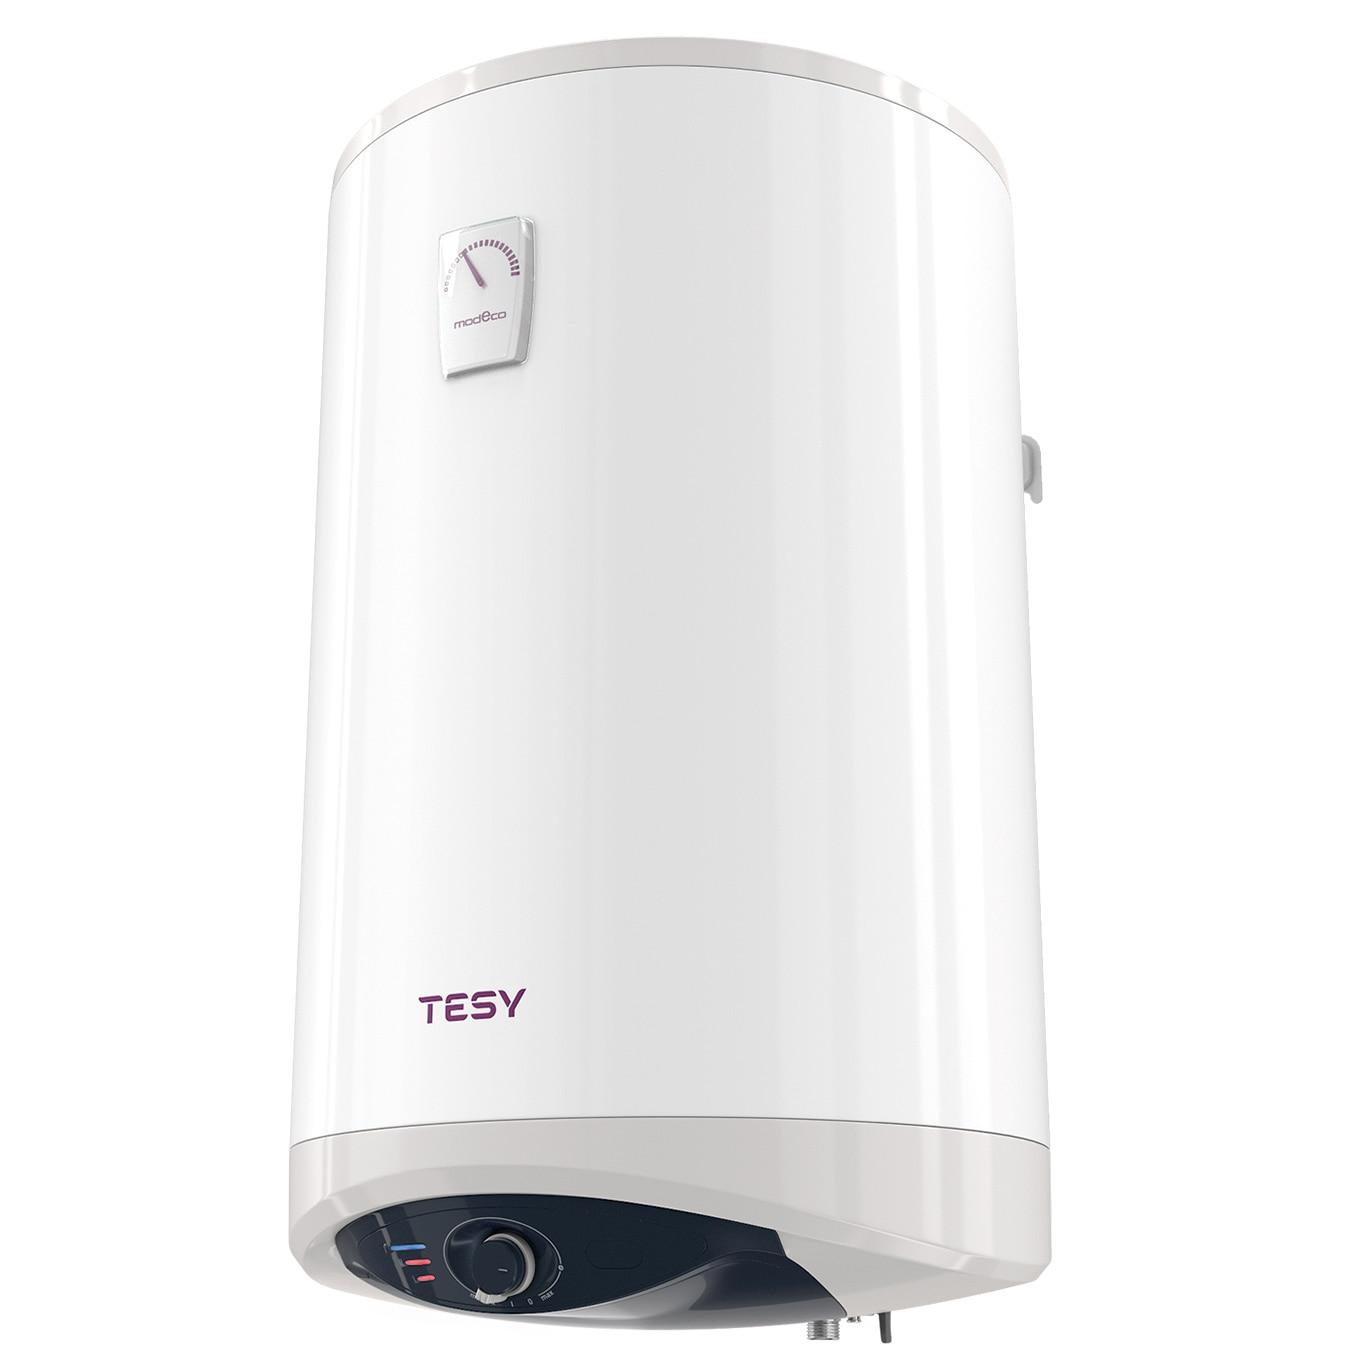 Fotografie Boiler electric vertical Tesy Modeco GCV 804716D C21 TS2RC, 1600 W, 80 litri, 2 trepte putere, Element de incalzire ceramic, cablu si stecher inclus